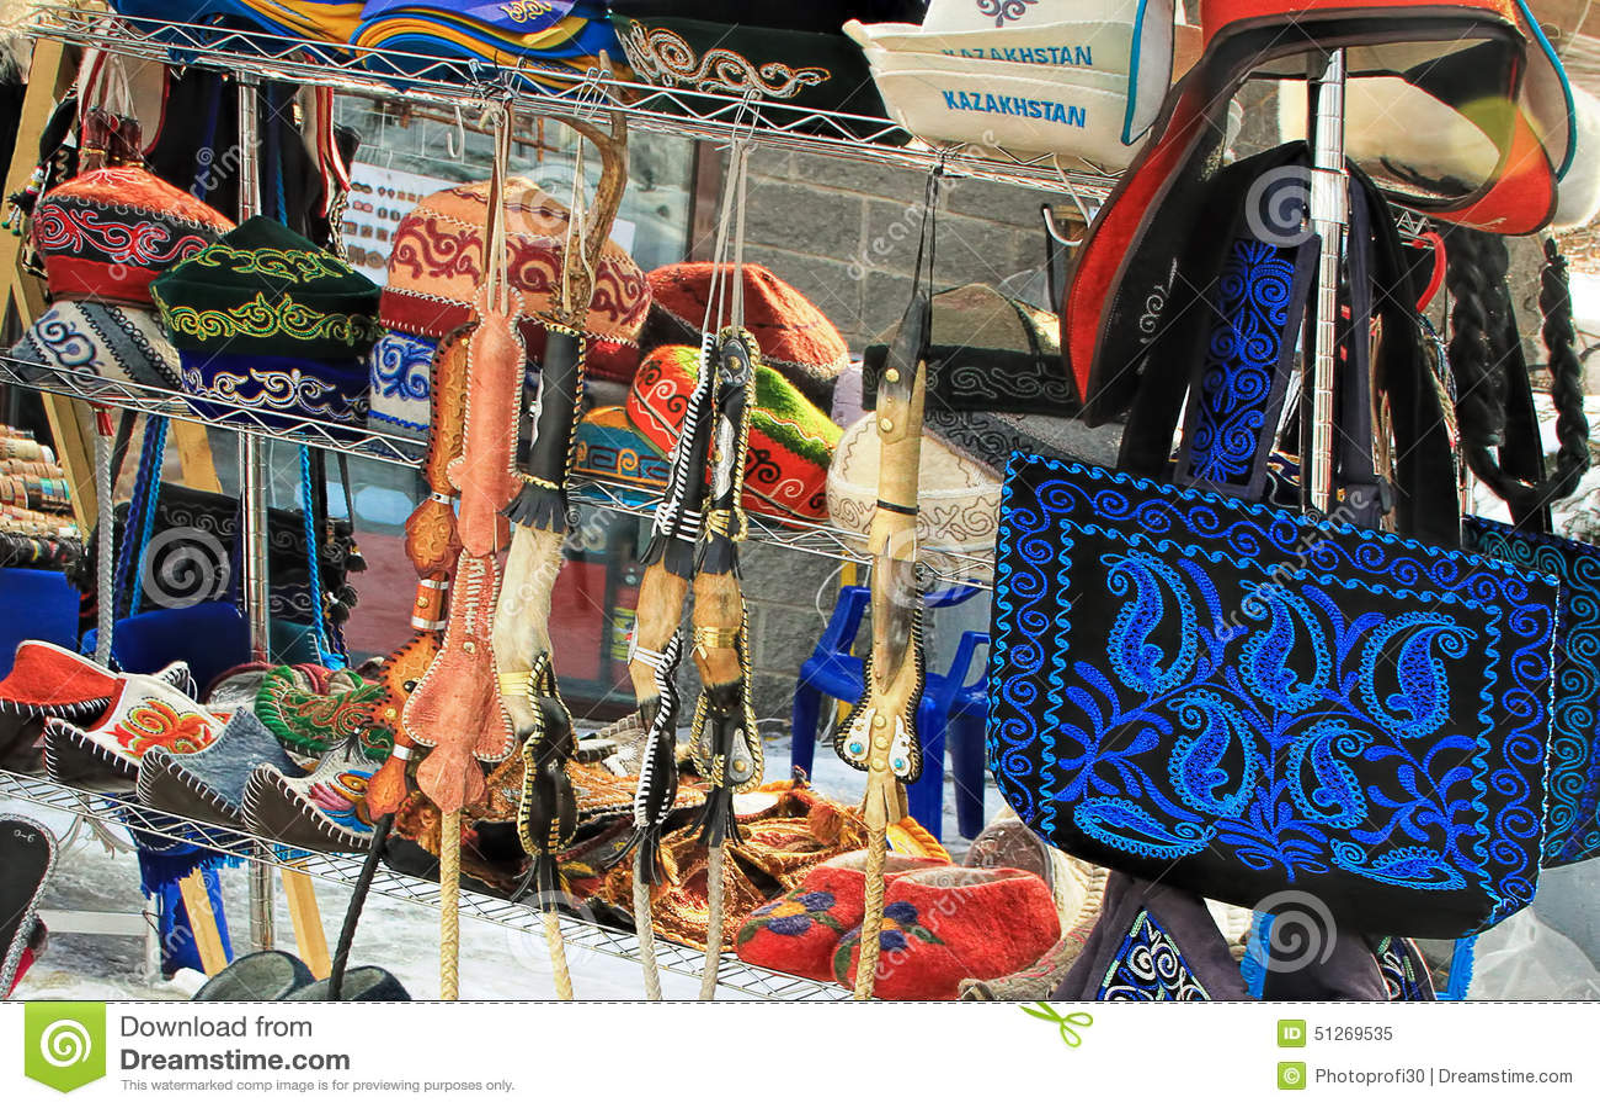 Almaty, il Kazakistan: ricordi tradizionali